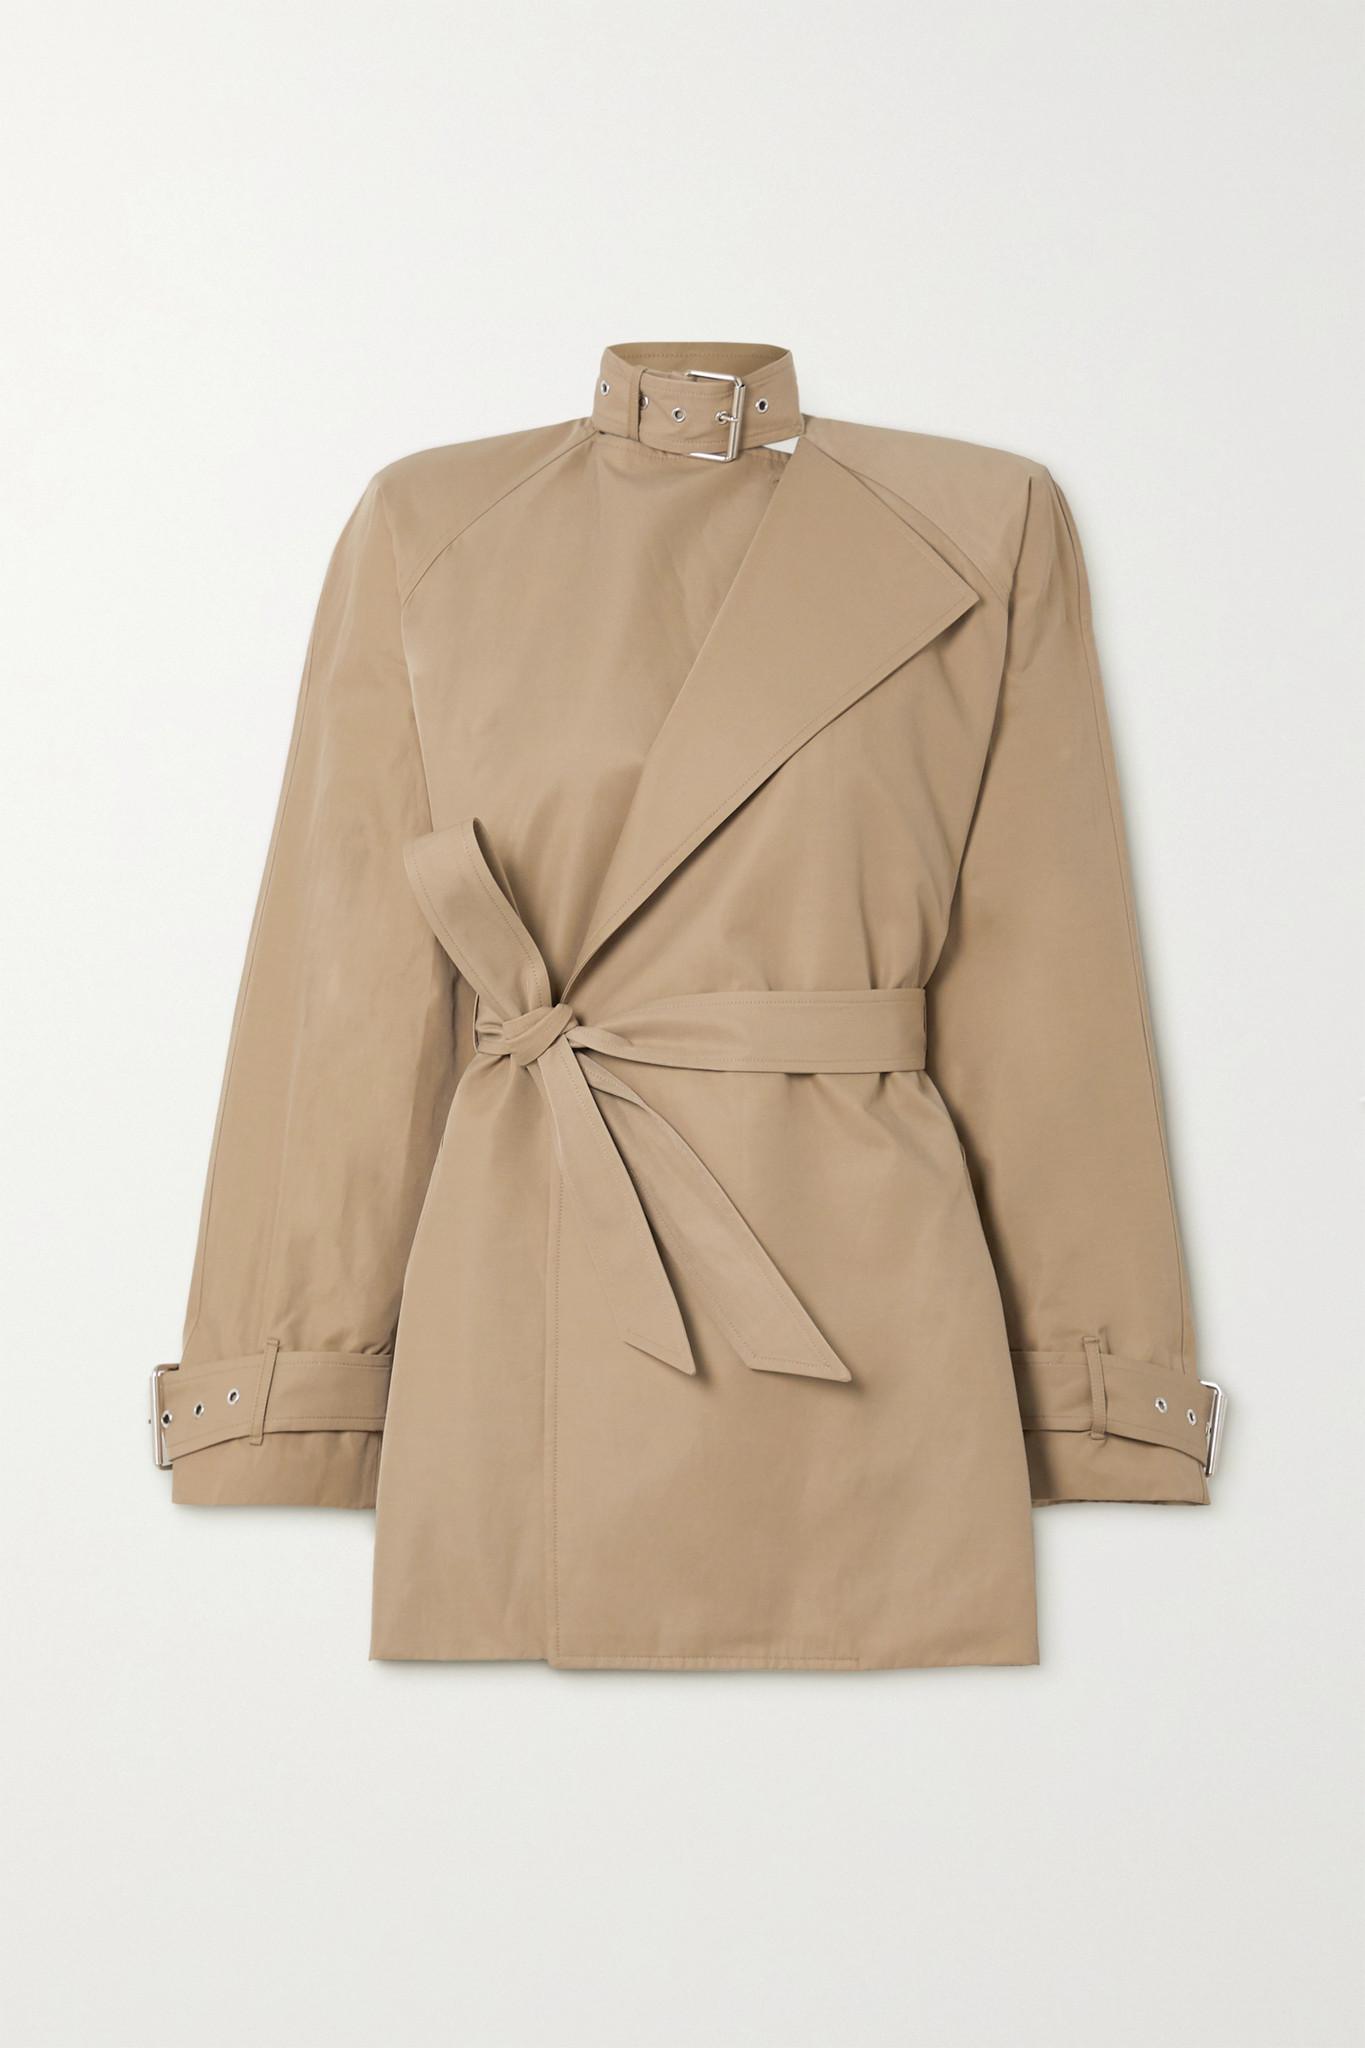 BALENCIAGA - Belted Cotton-blend Twill Coat - Neutrals - FR38